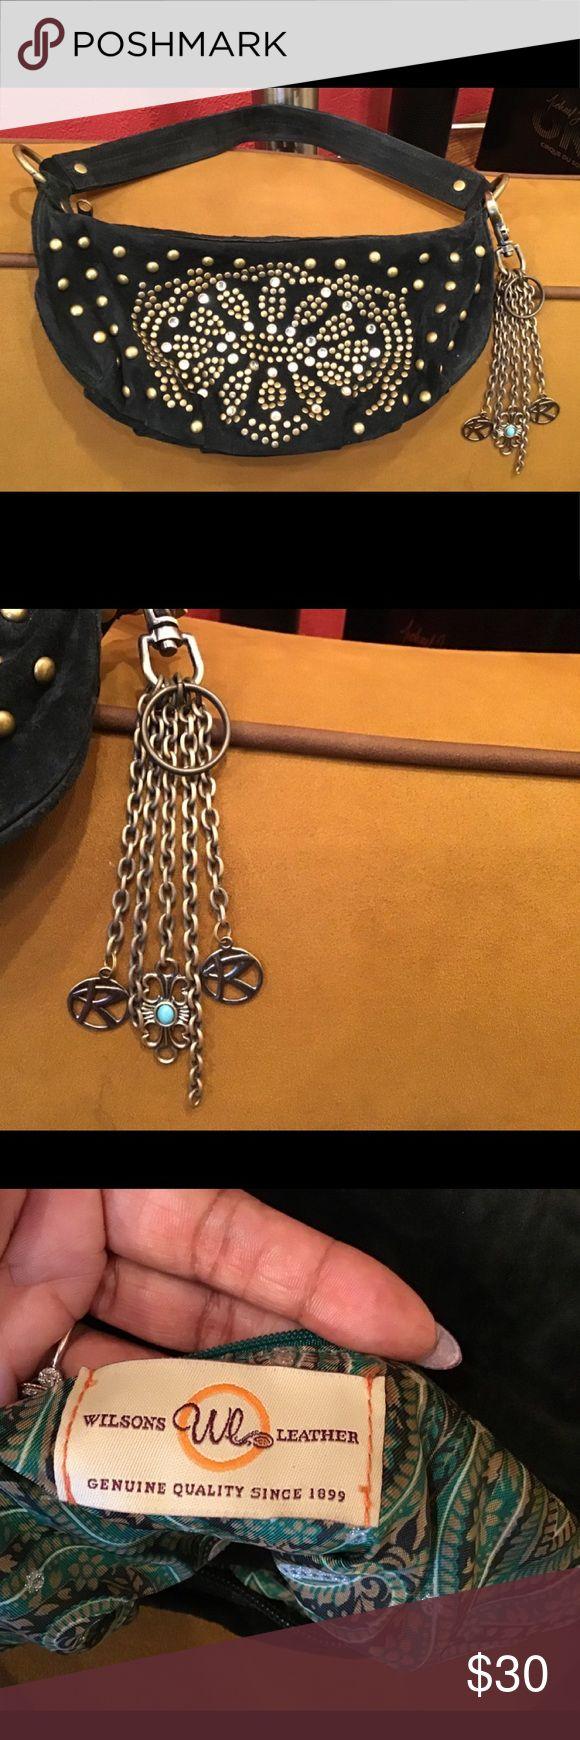 Wilson Genuine Leather Purse 🌟 Genuine leather purse